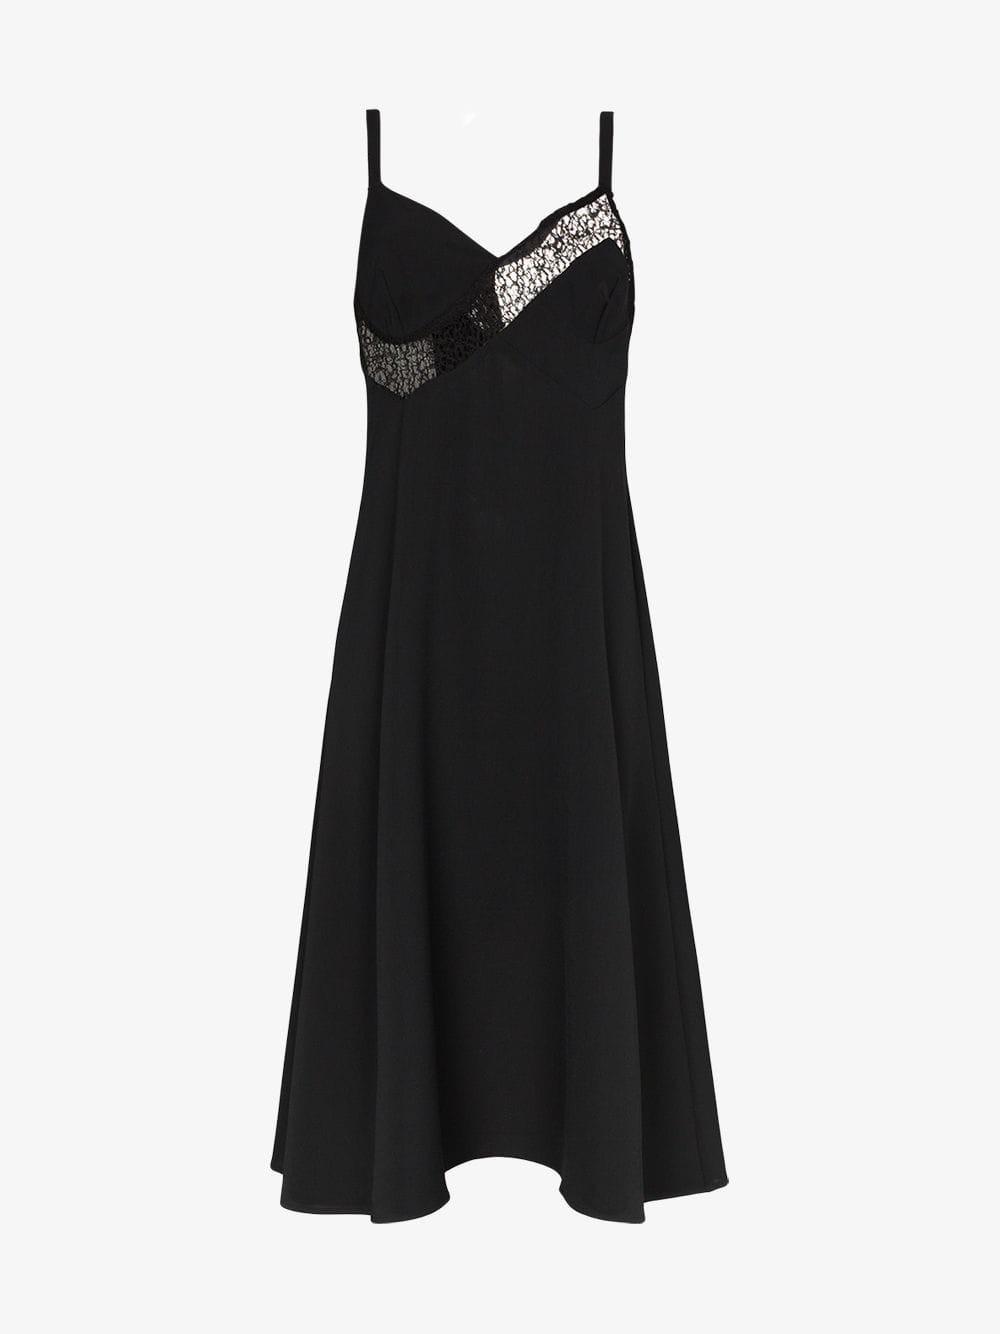 Beaufille Palici midi dress in black